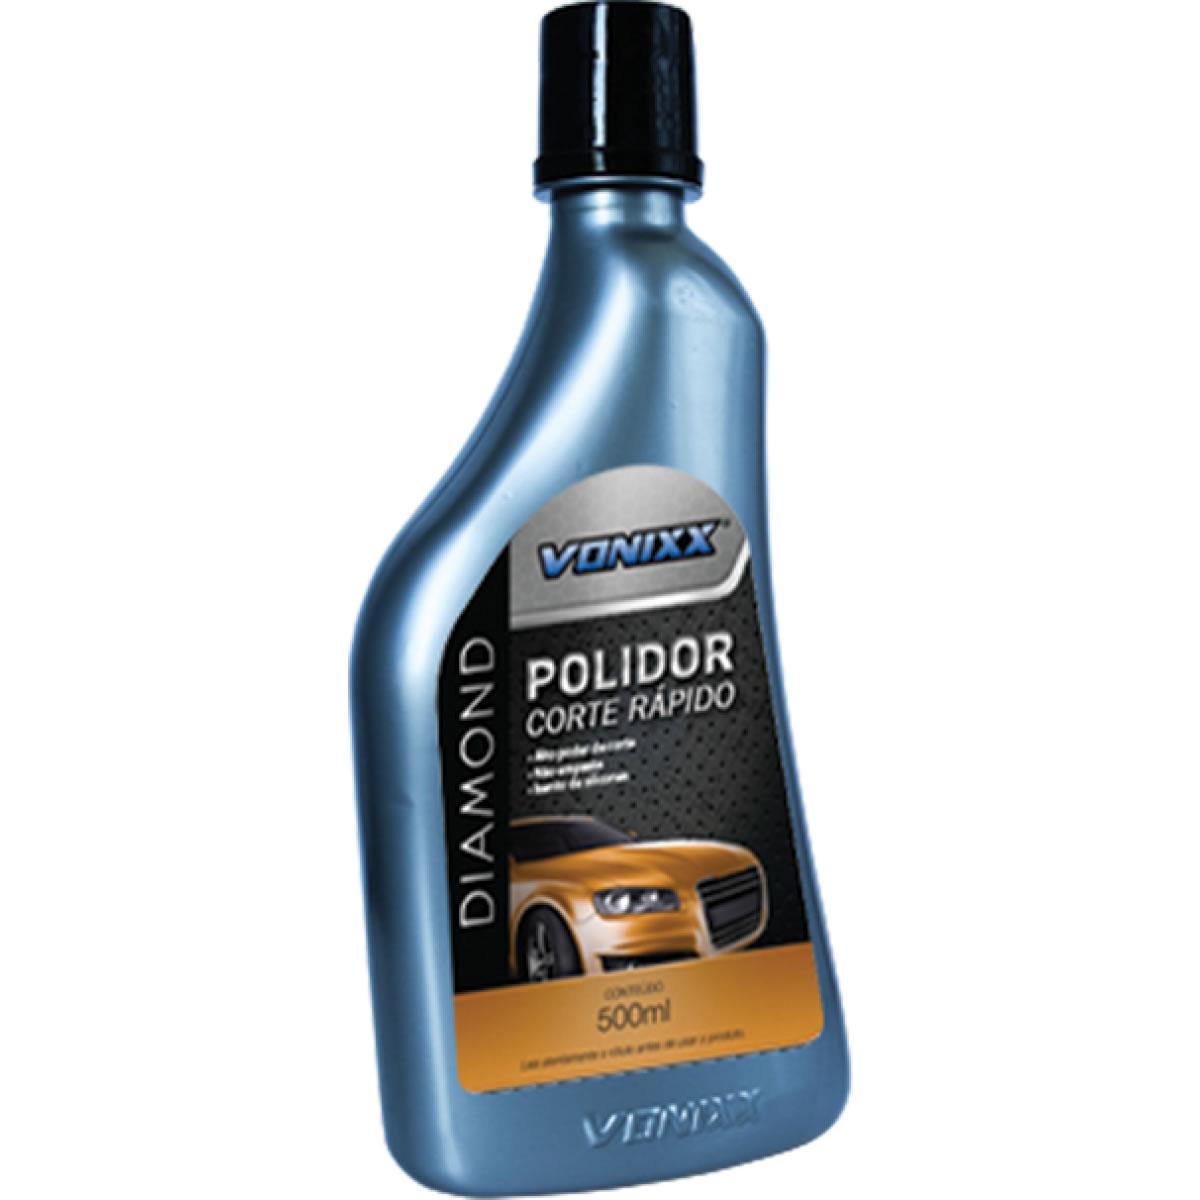 Vonixx Diamond Polidor Corte Rápido - 500ml  - Loja Go Eco Wash